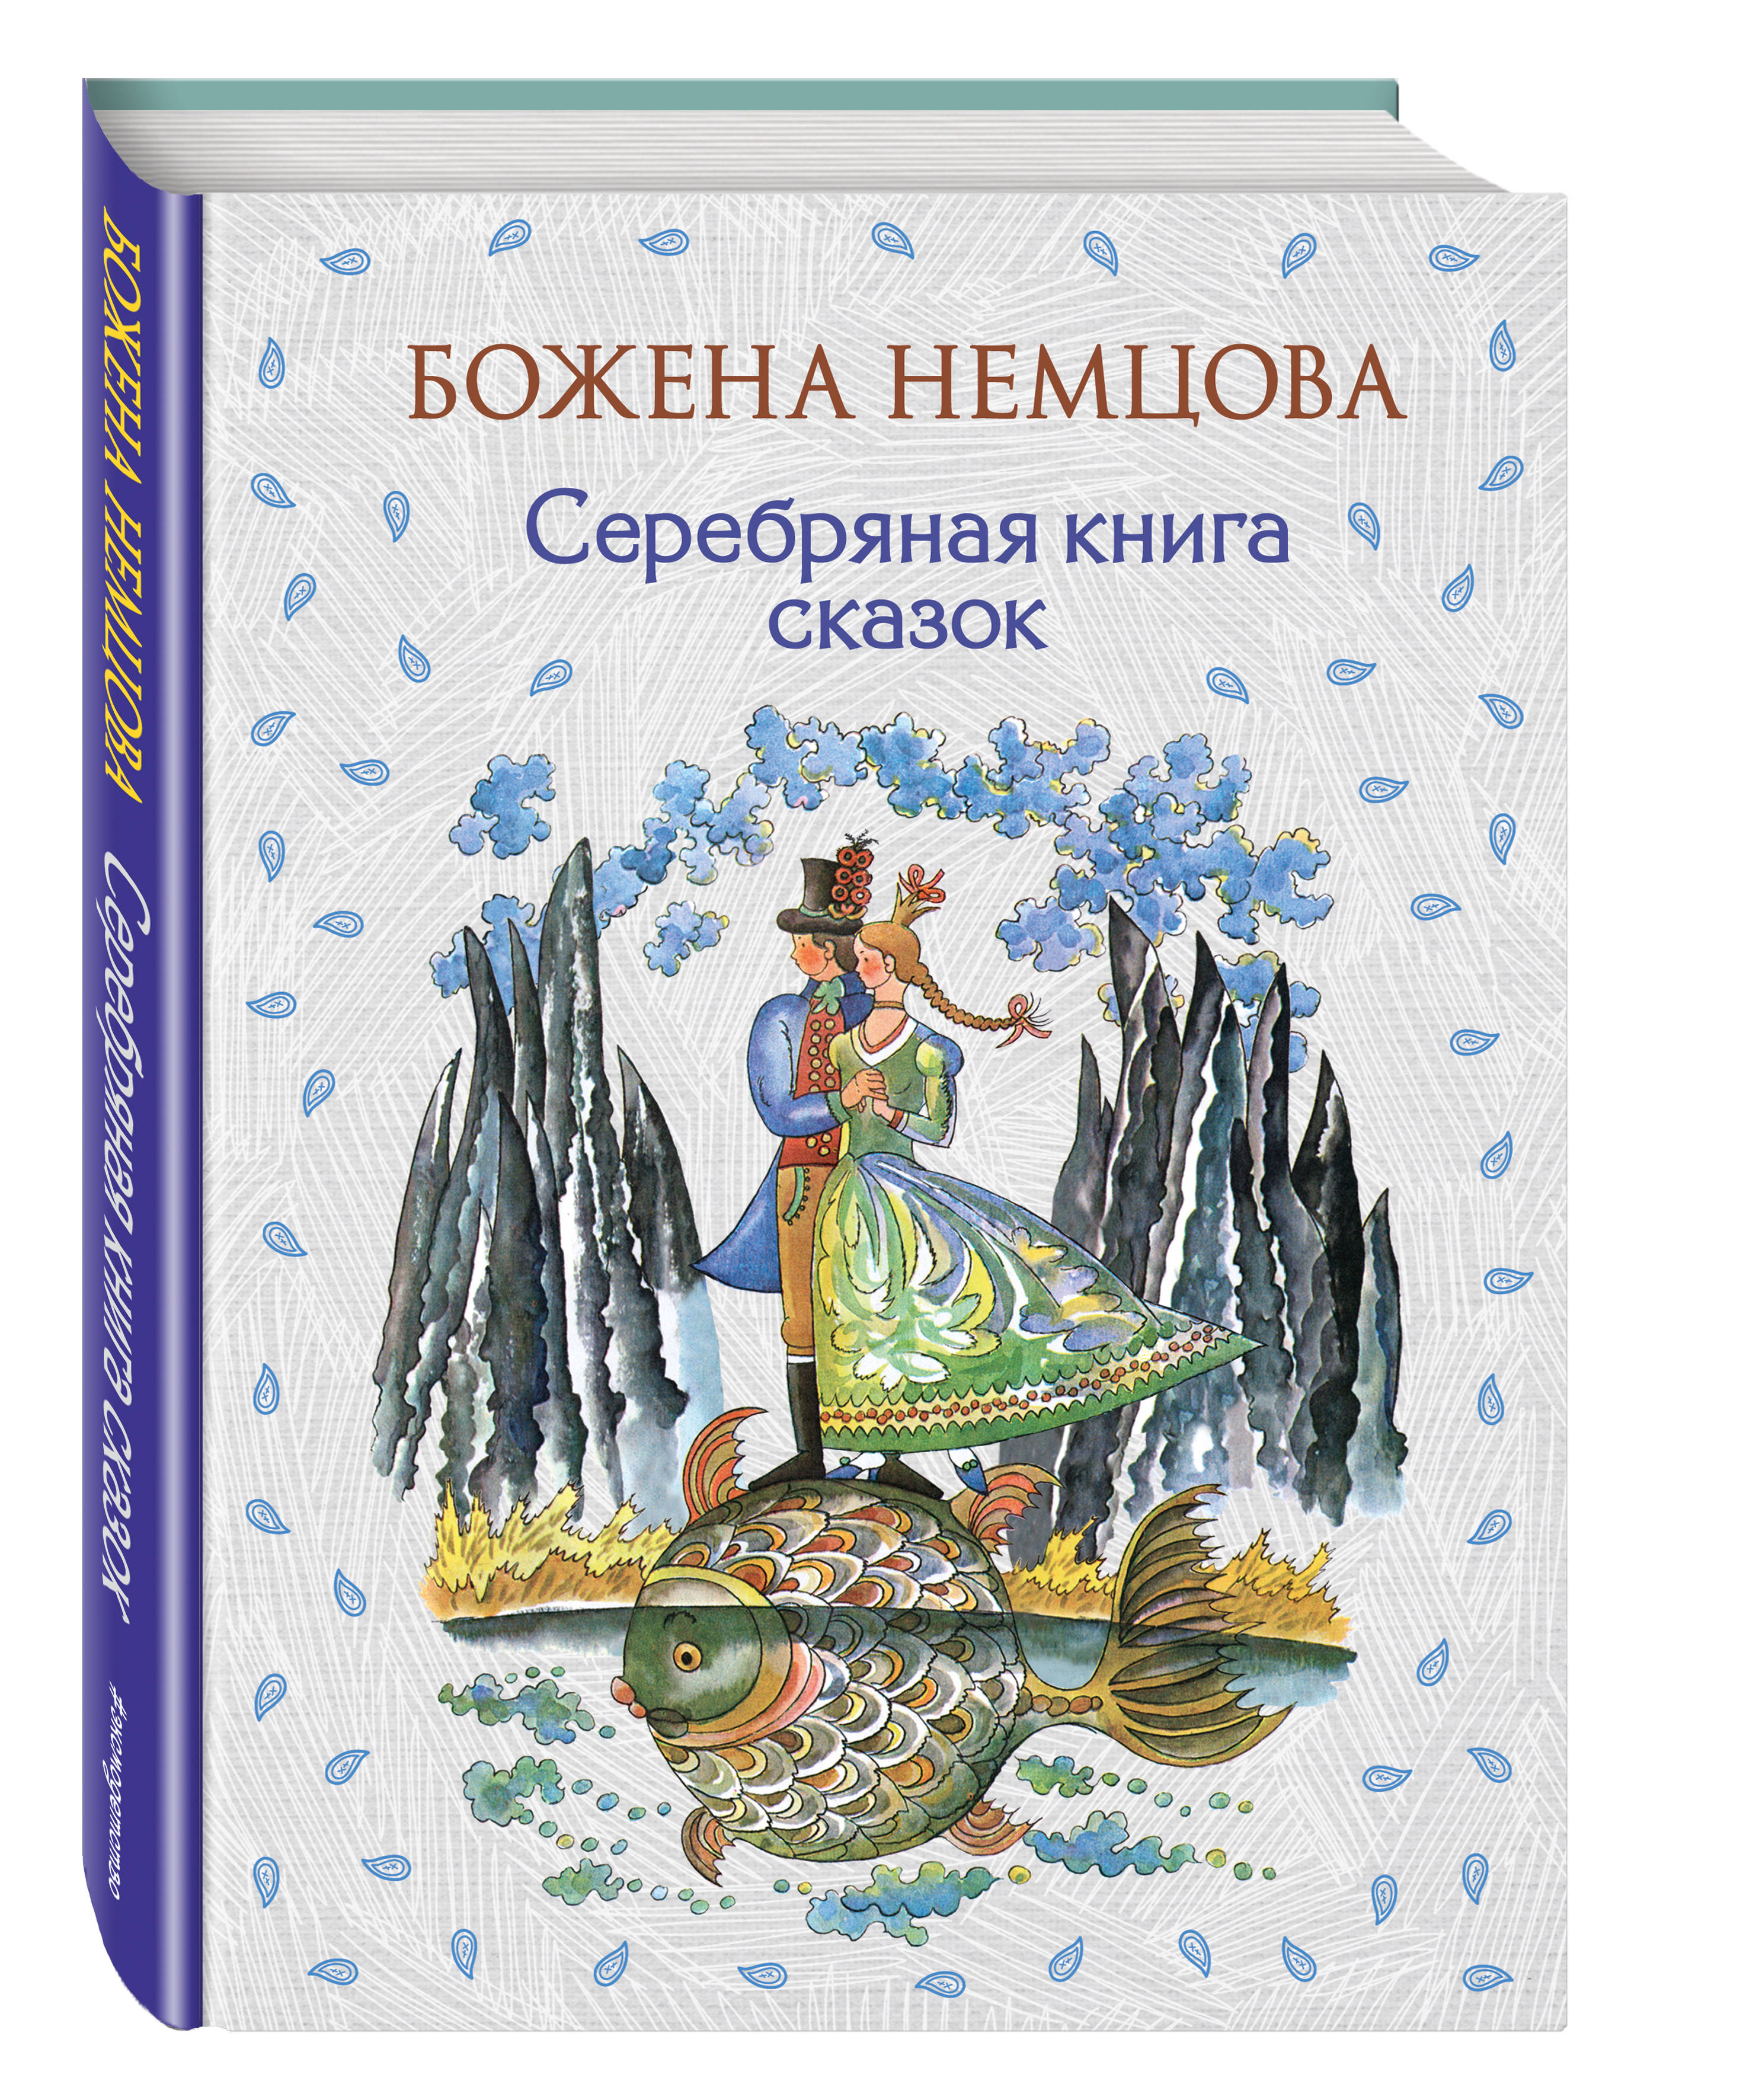 Немцова Б. Серебряная книга сказок (ил. Ш. Цпина) серебряная книга сказок